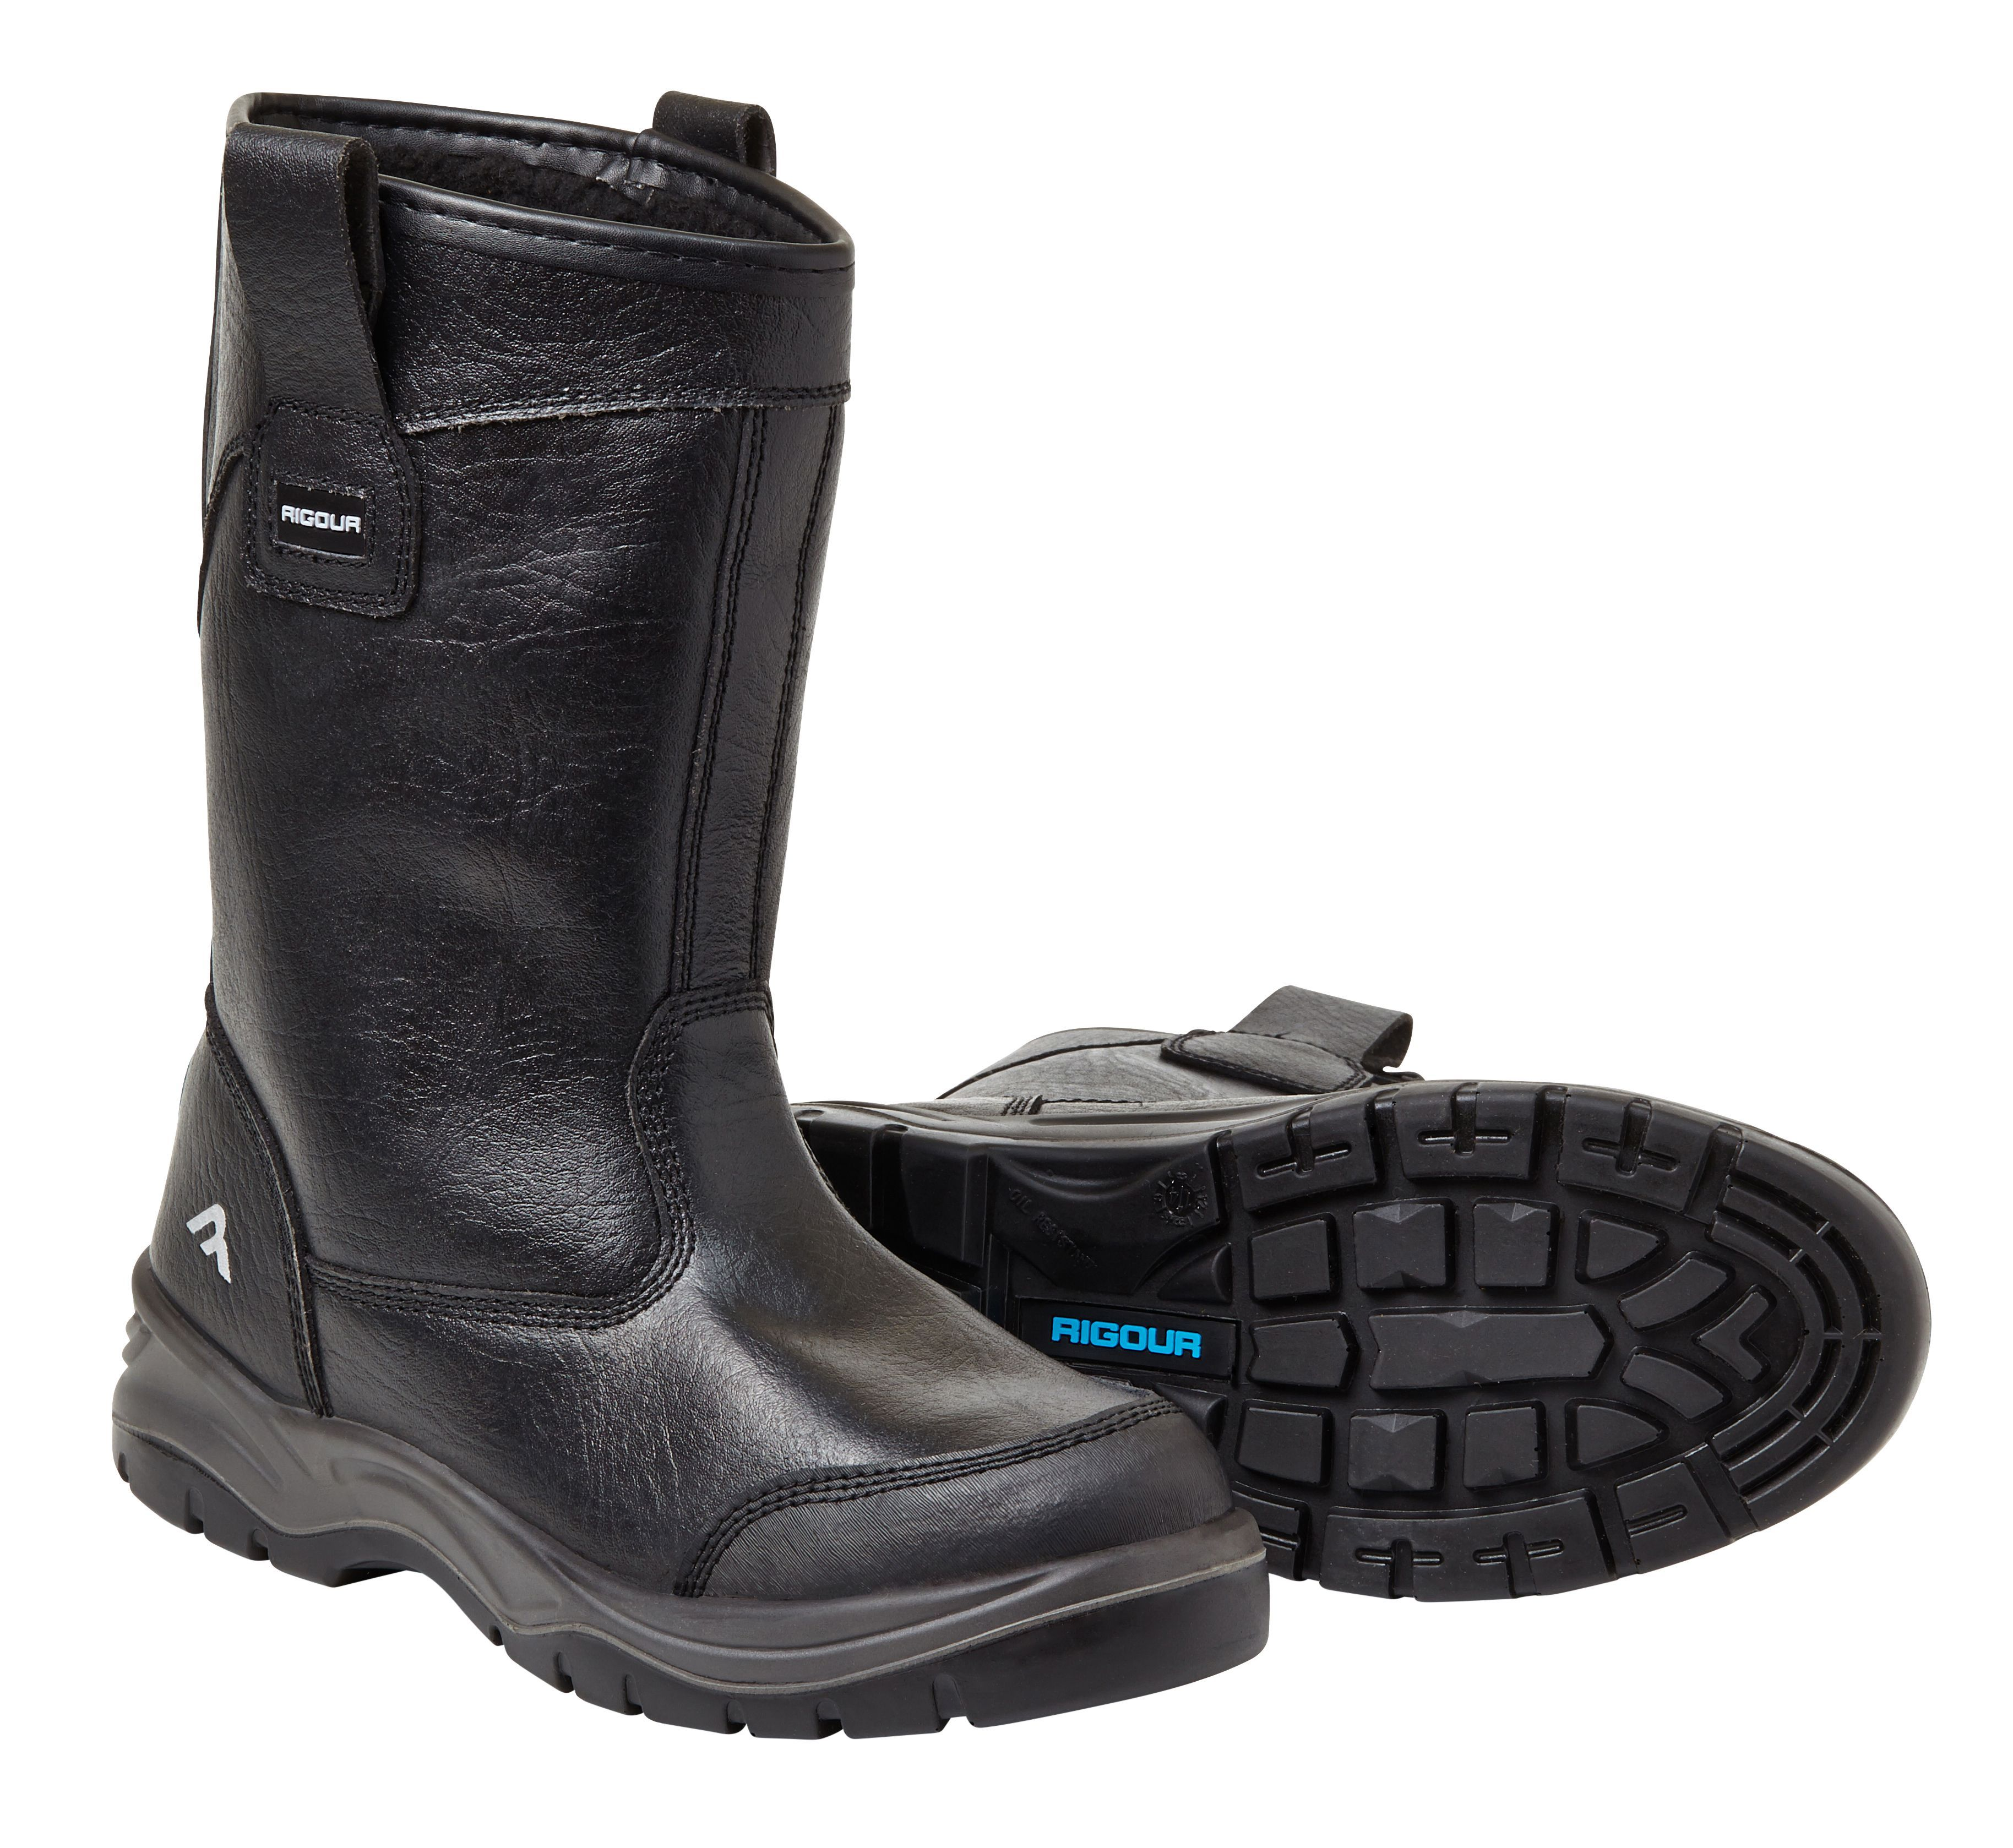 Rigour Black Rigger Boots, Size 9